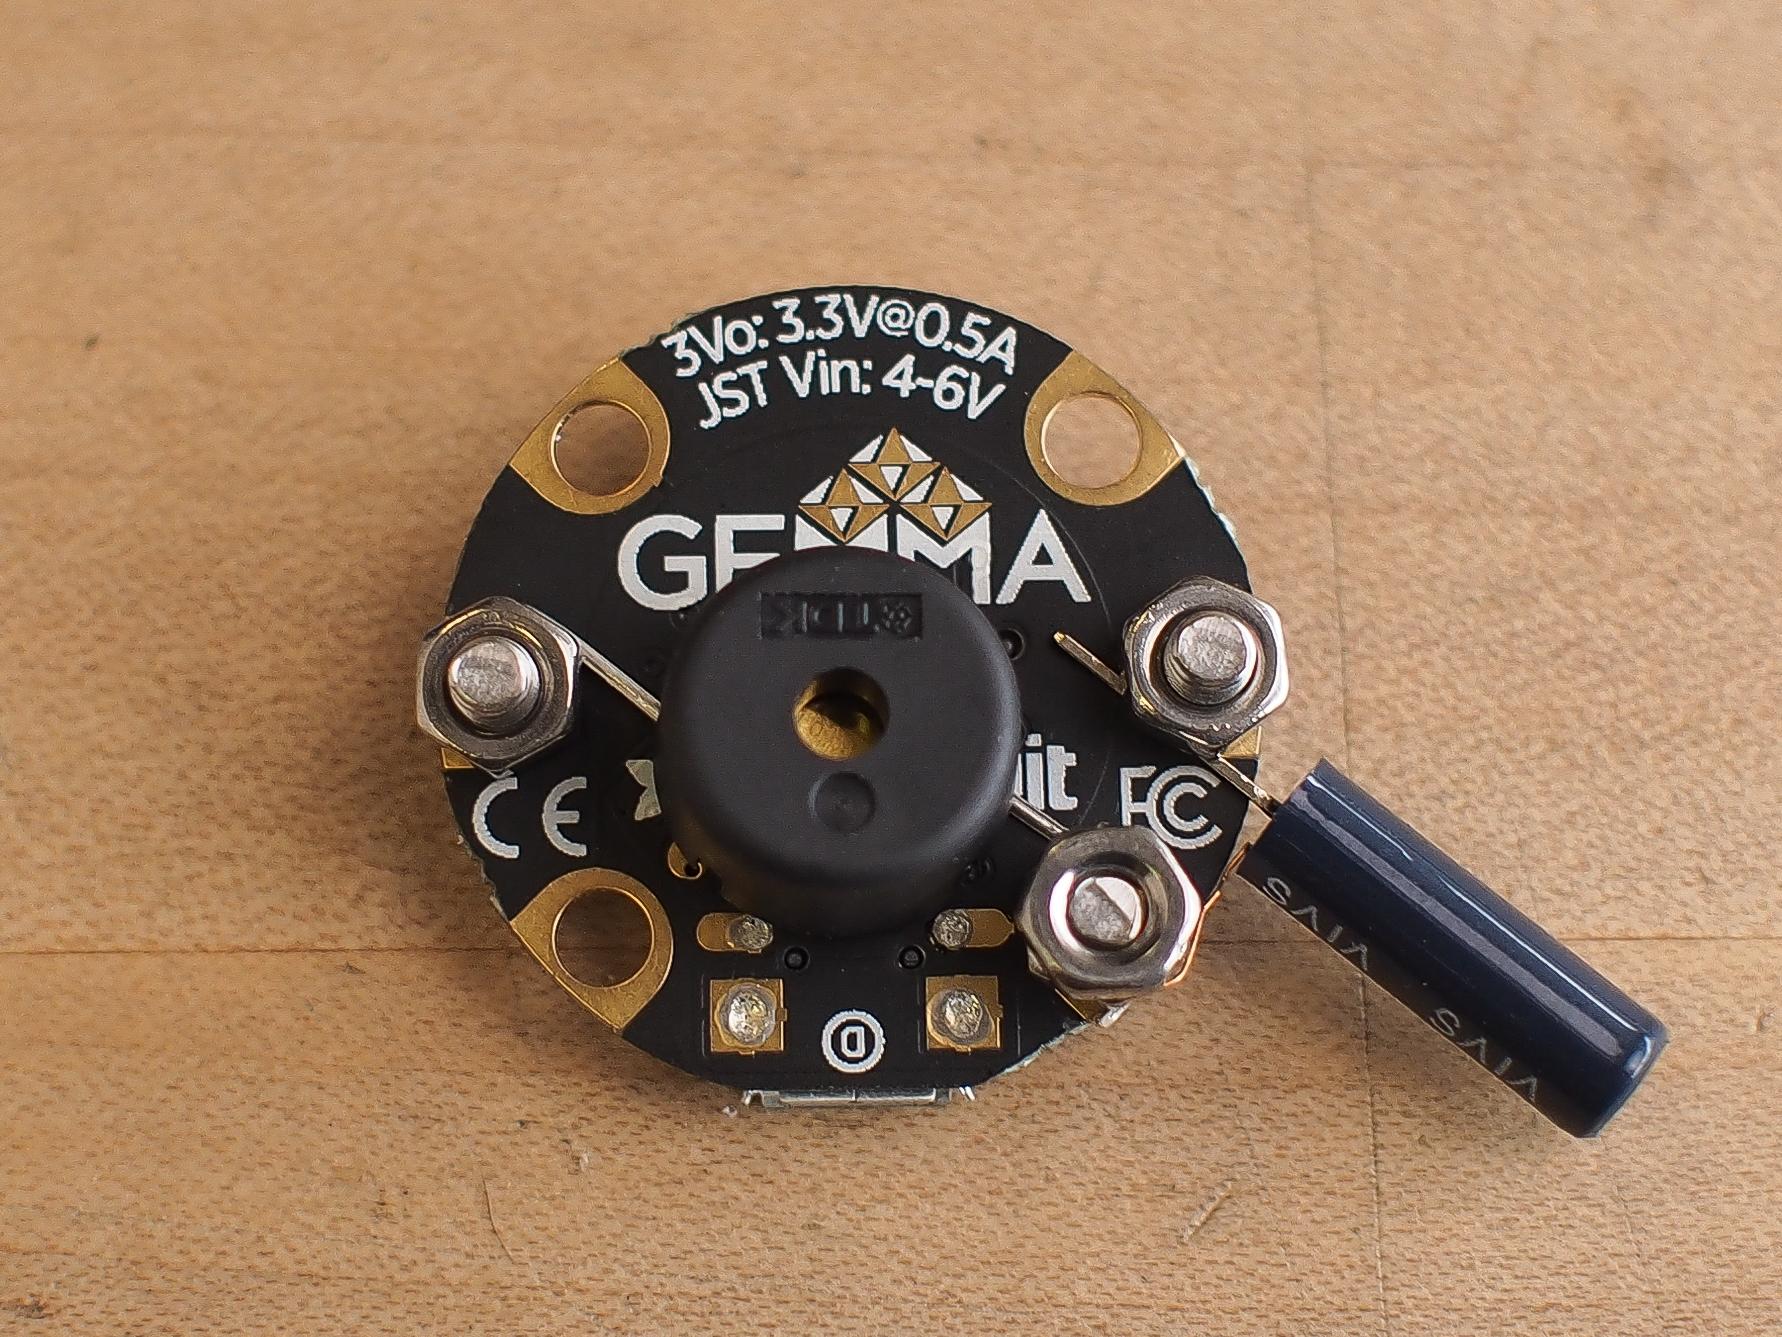 sensors_P3110523_2000.jpg